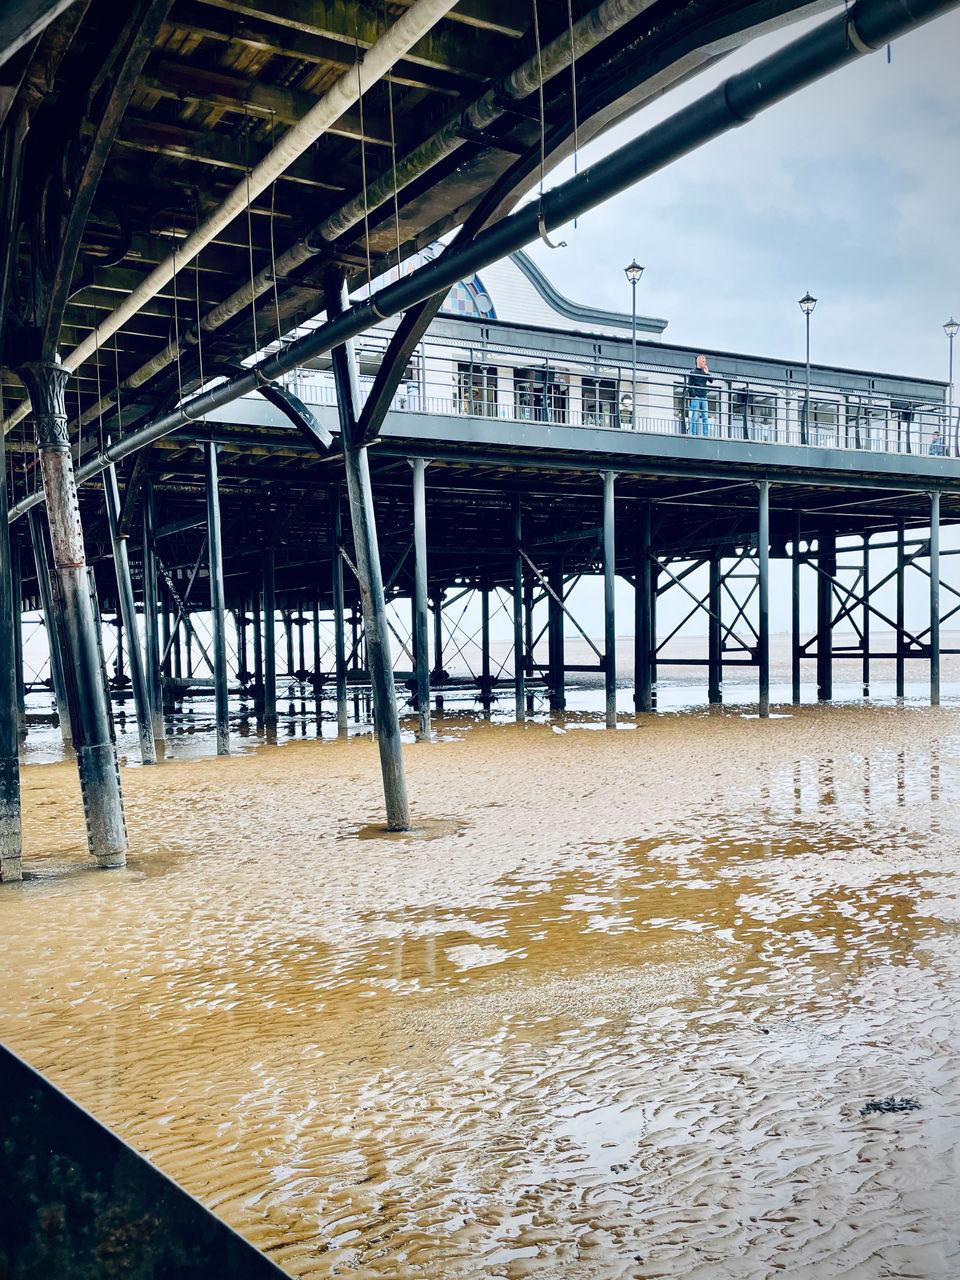 PIER OVER SEA AGAINST BUILDINGS